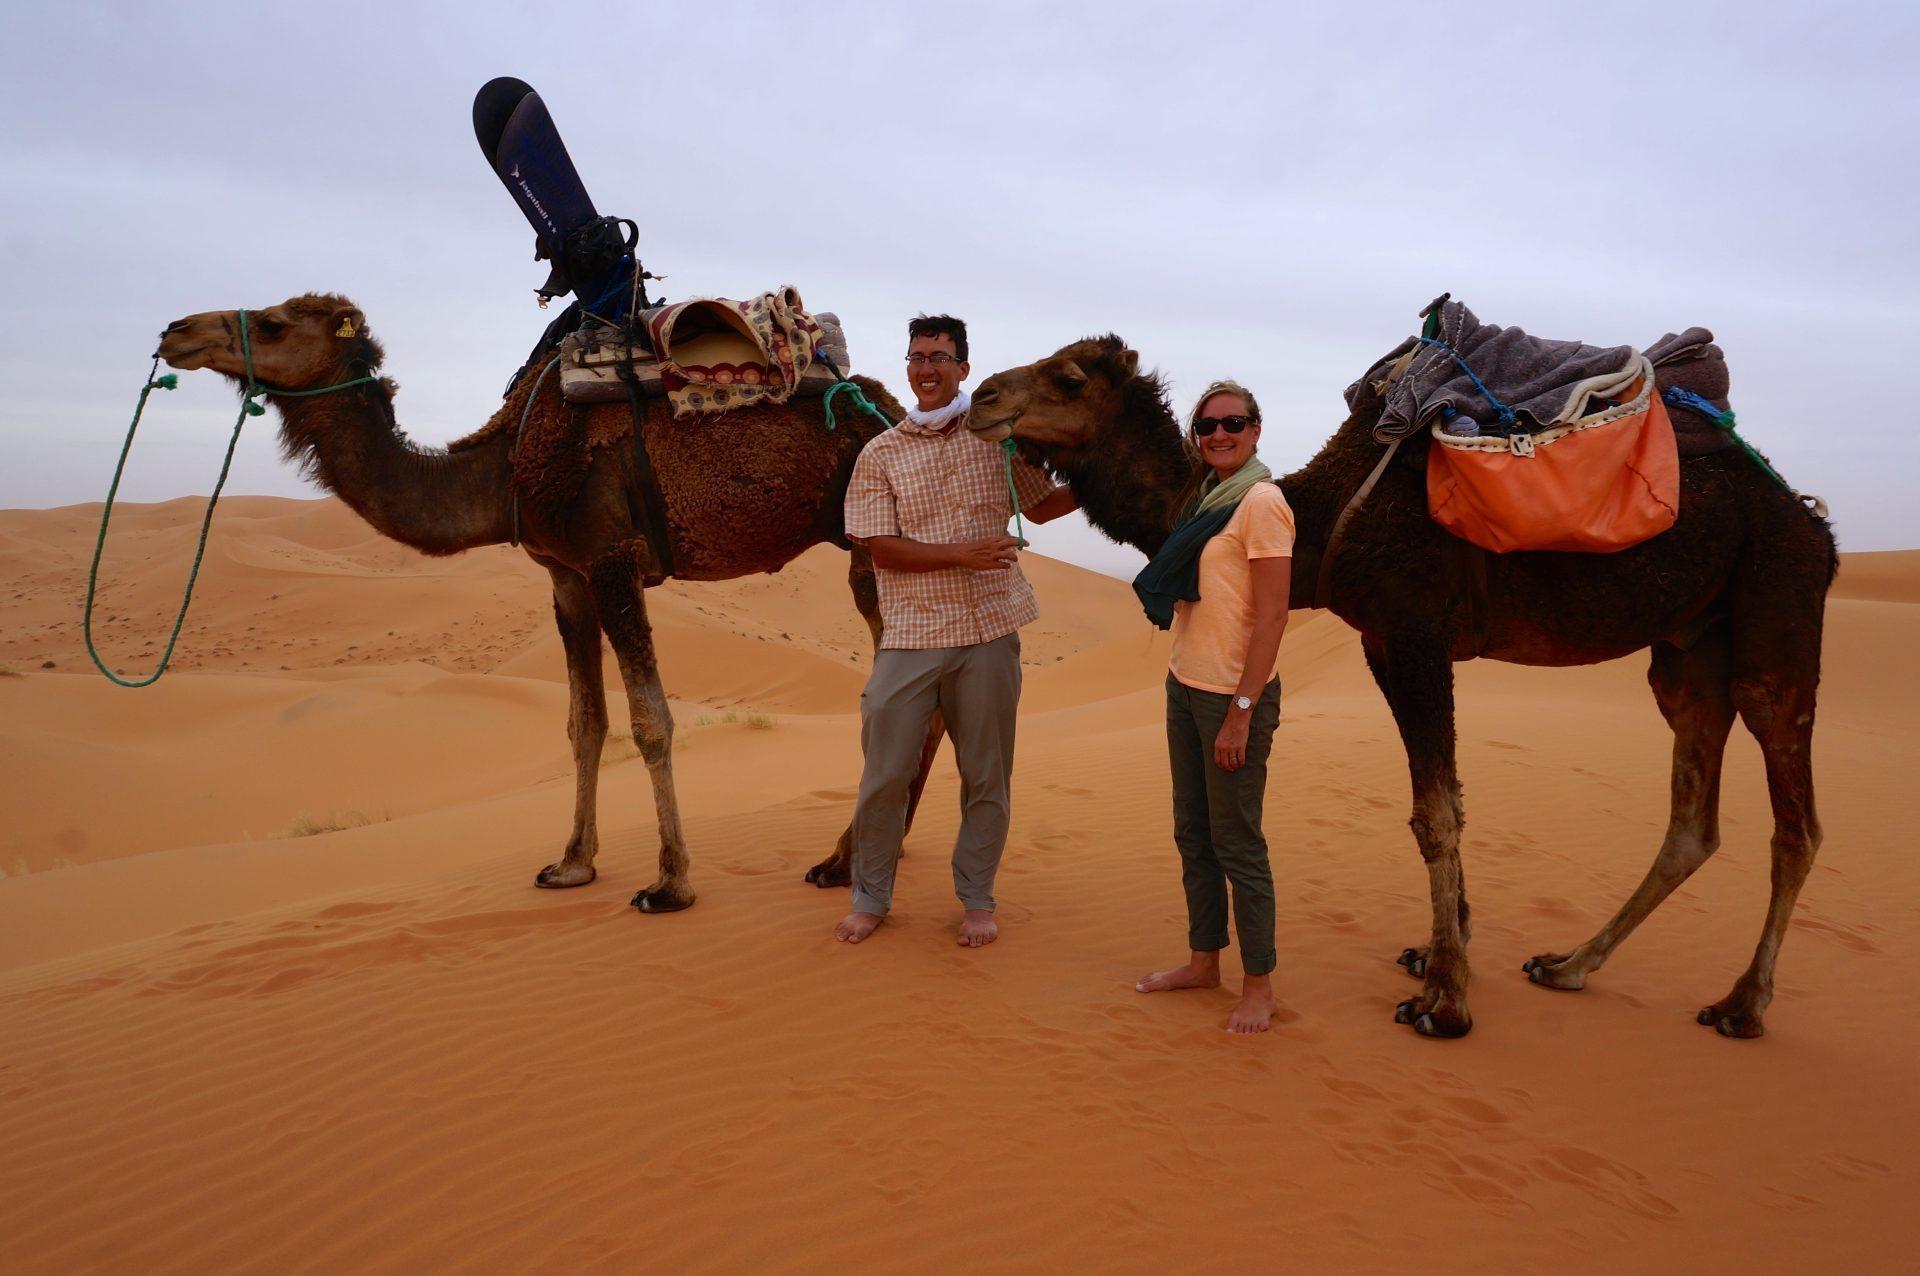 sandstorm and sandboarding our camel trek into the sahara desert